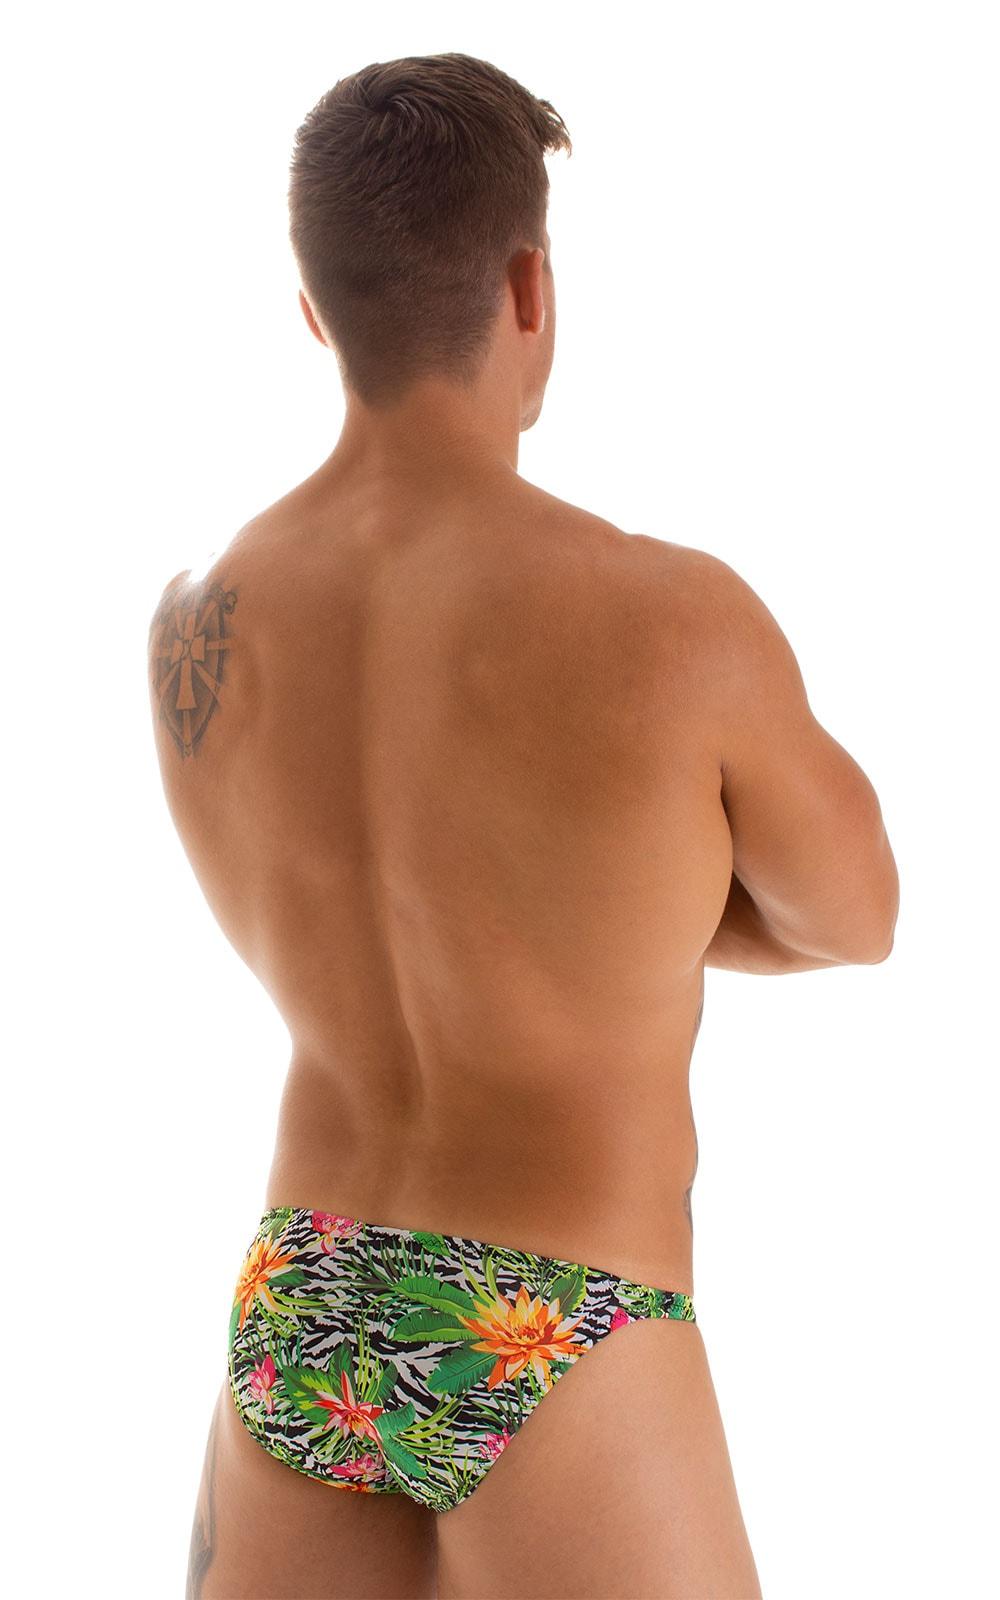 Stuffit Pouch Bikini Swimsuit in Super ThinSKINZ Exotic Tropics 2